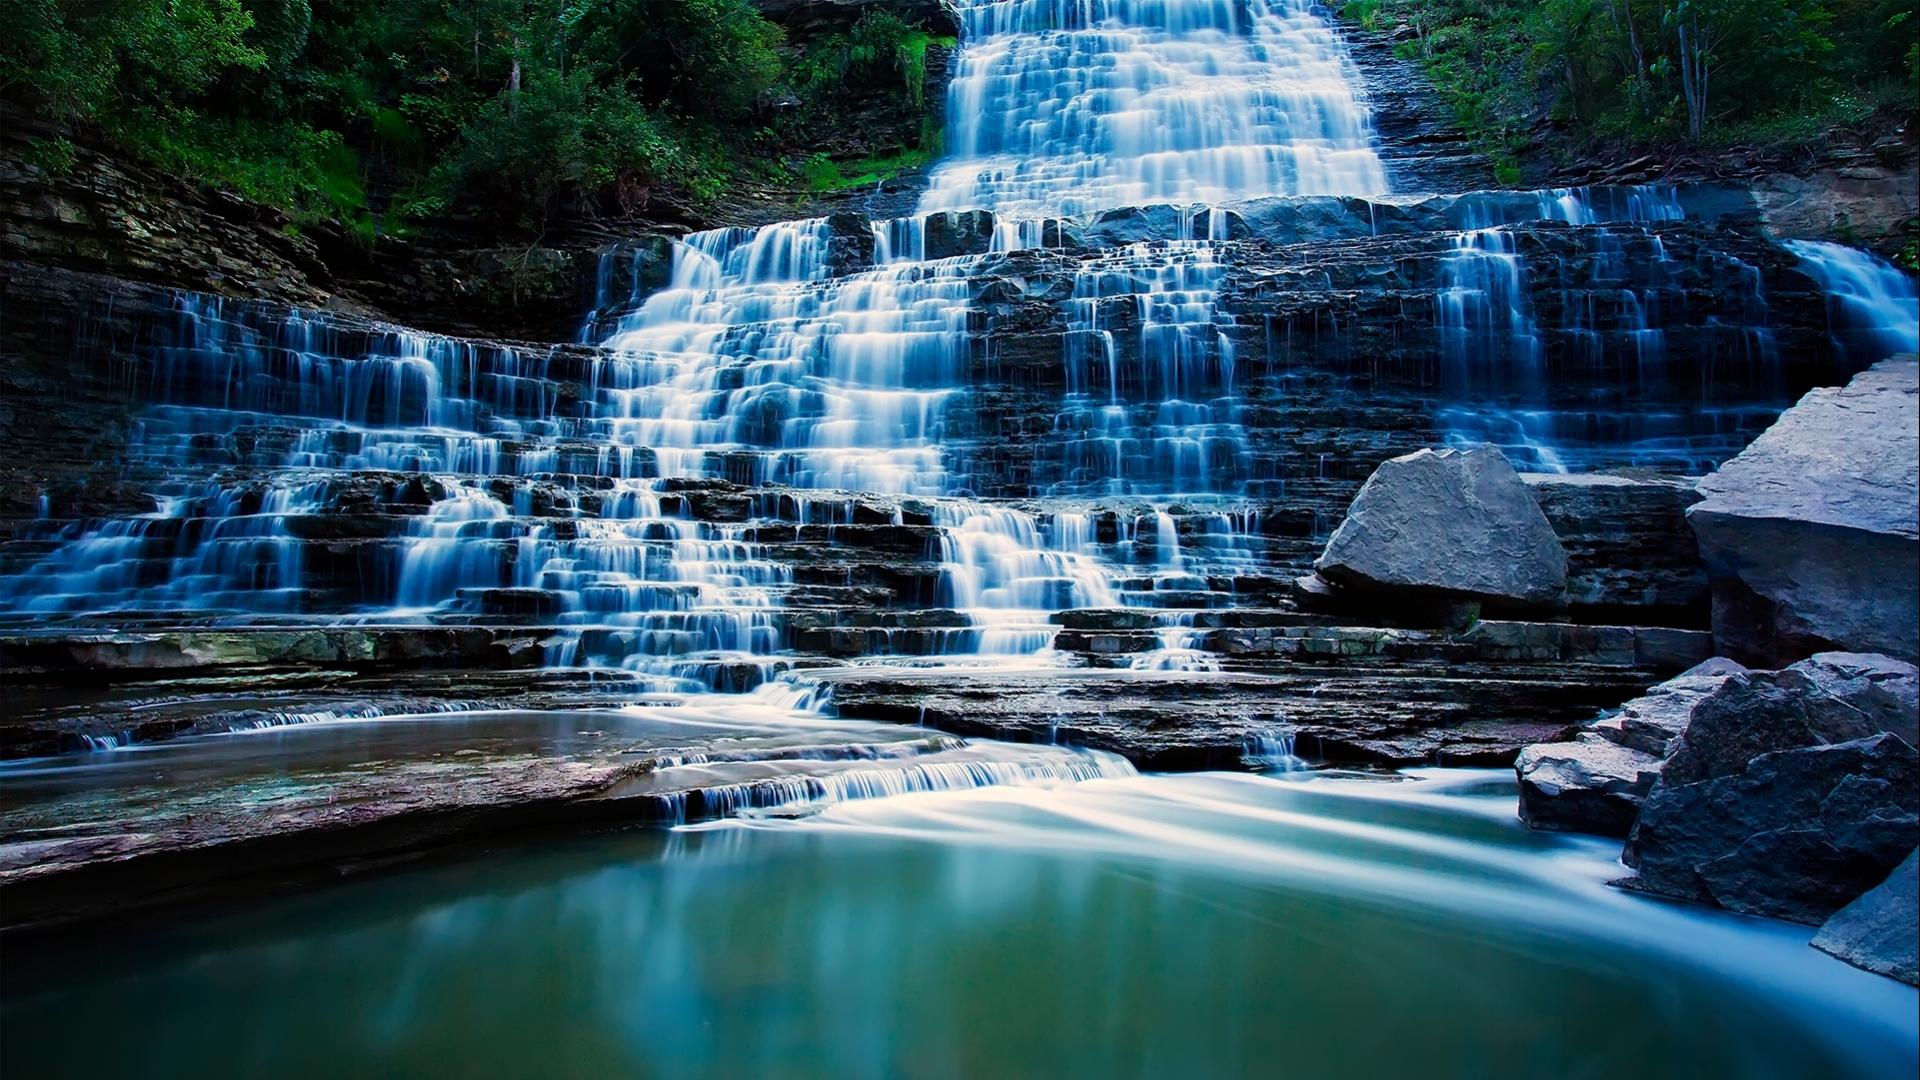 waterfalls wallpapers most beautiful - photo #40